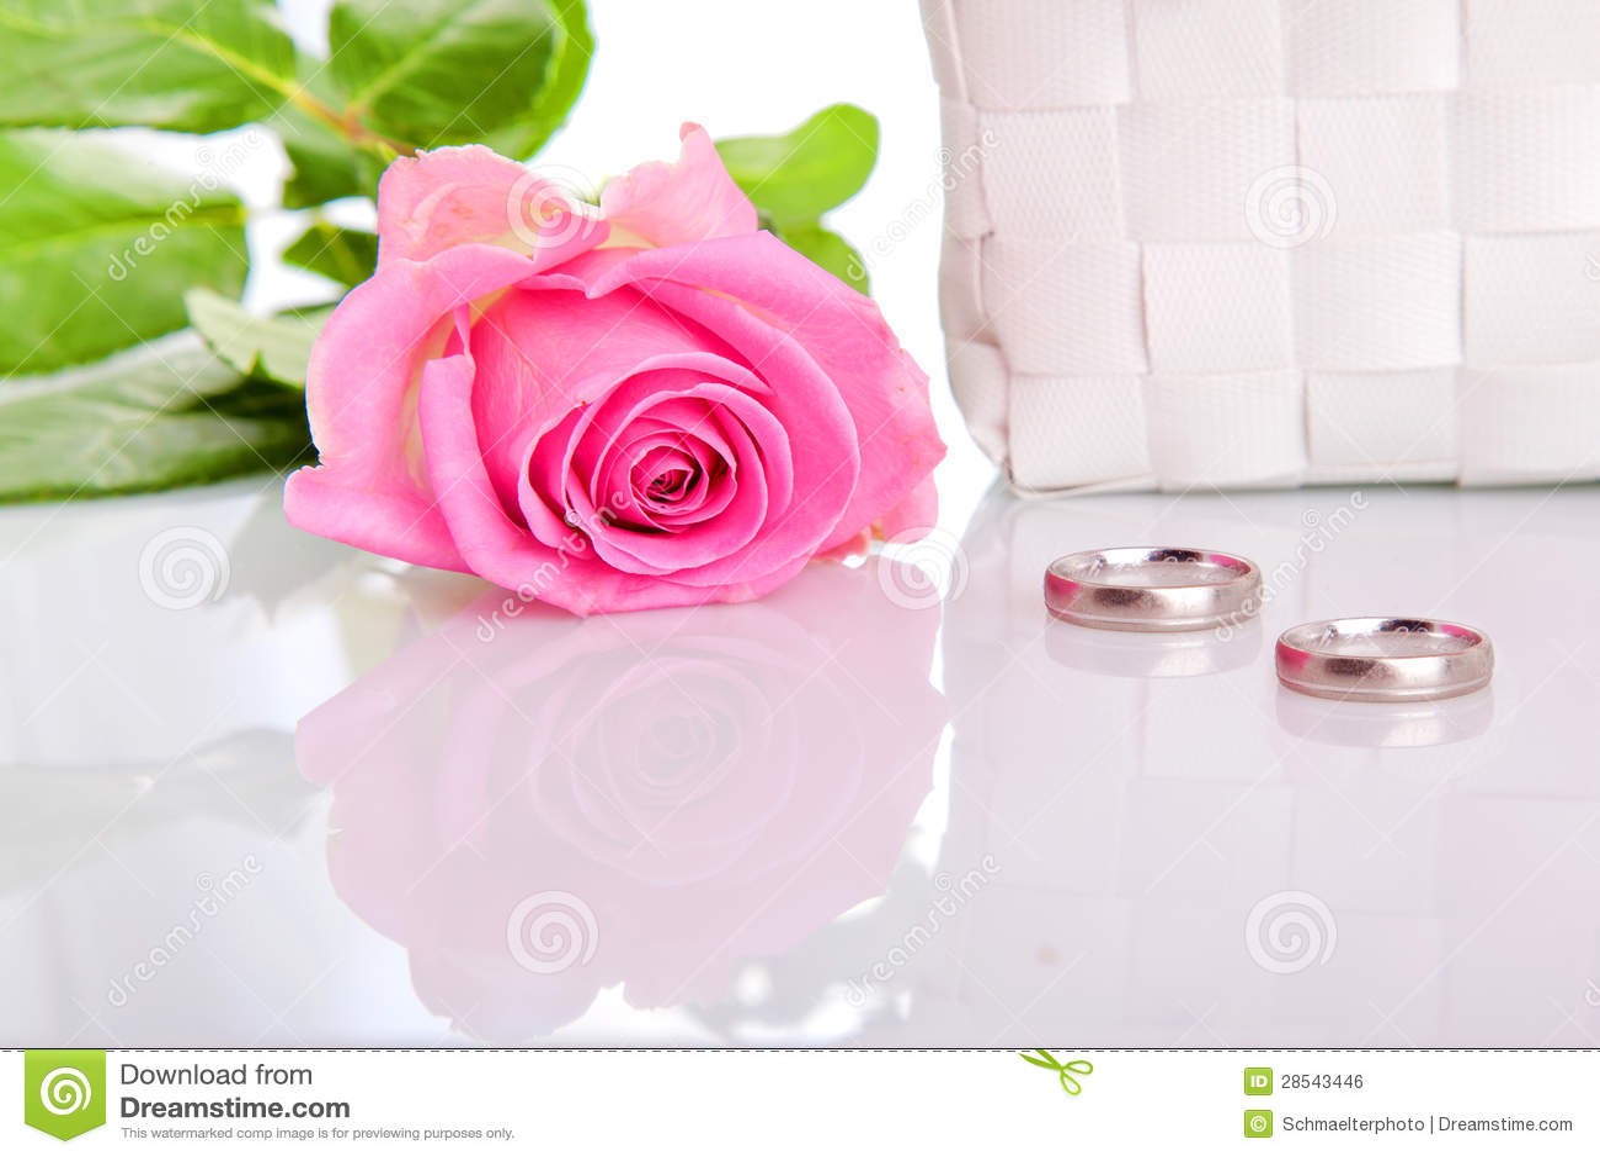 stock photo pink roses wedding rings image pink wedding rings Wedding rings and pink roses Royalty Free Stock Image